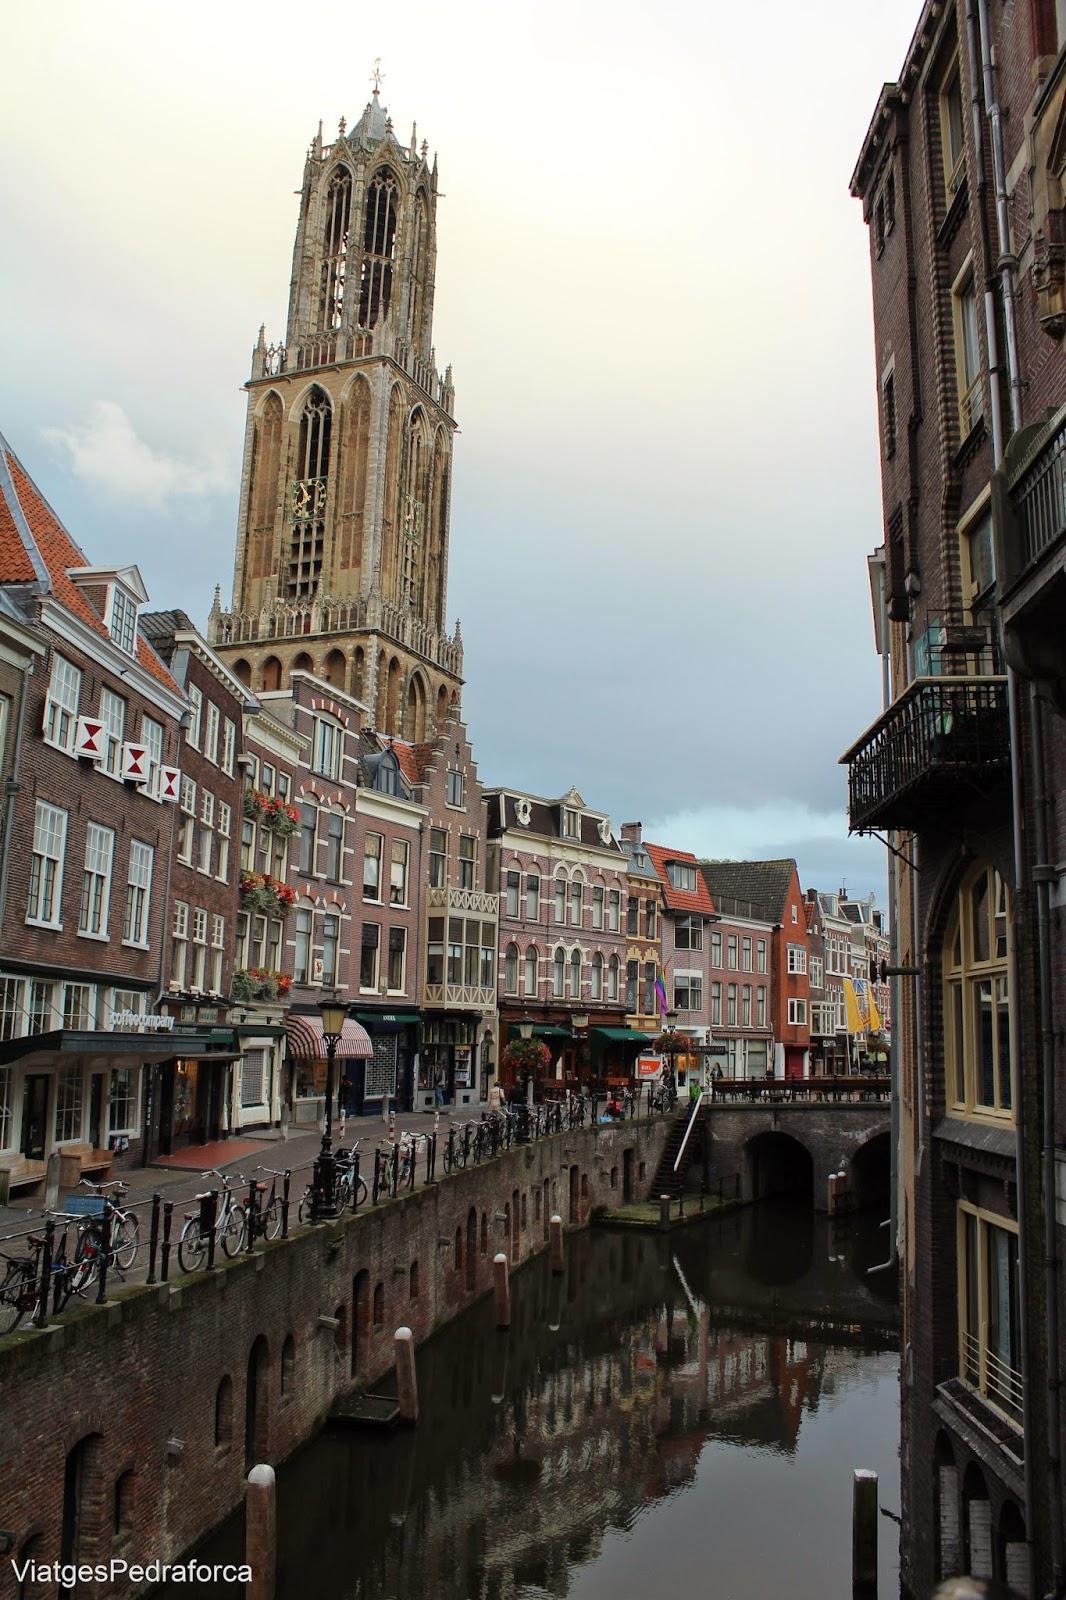 Domtoren Utrecht Països Baixos Holanda